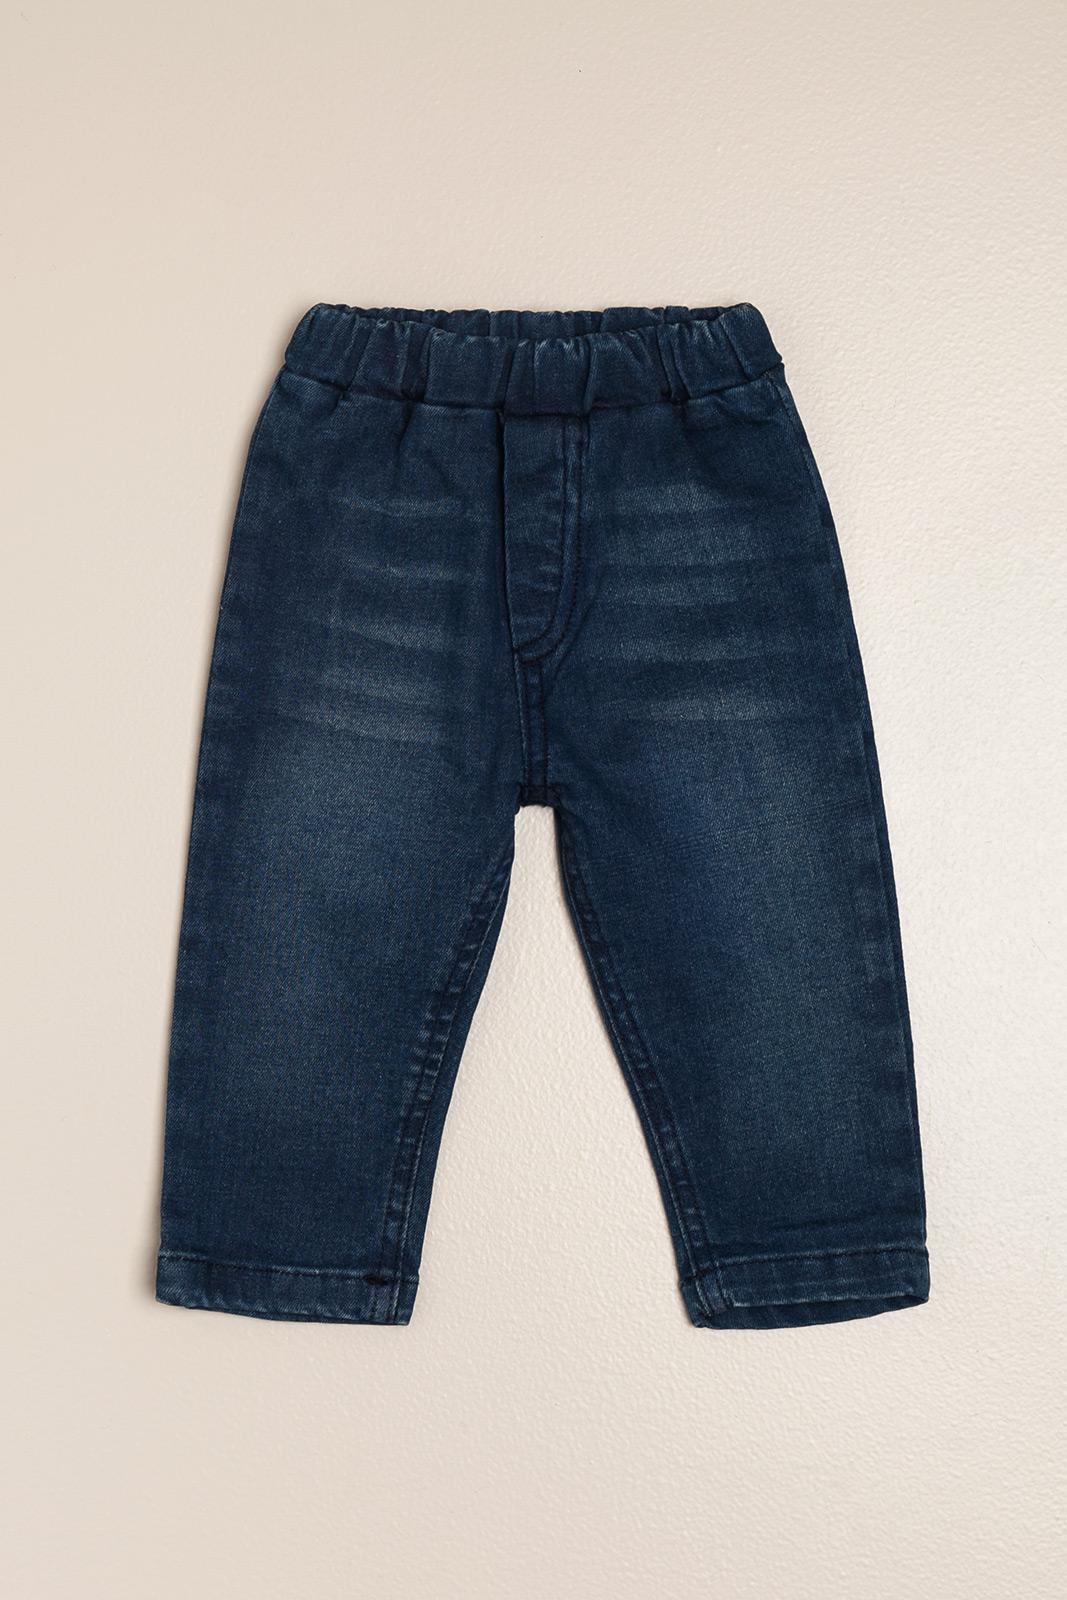 Pantalon jean para bebes